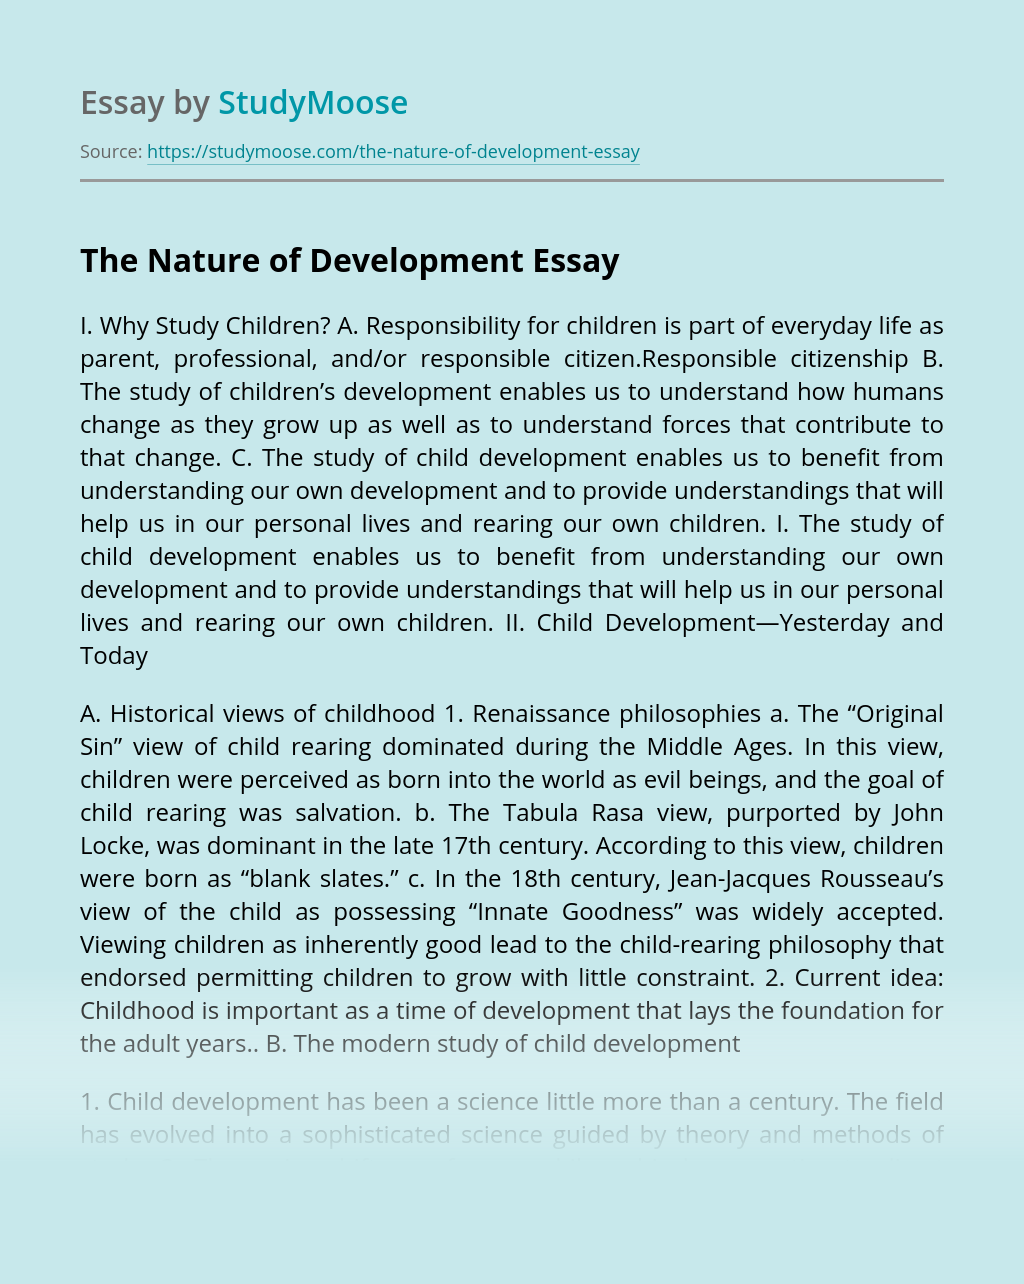 The Nature of Development